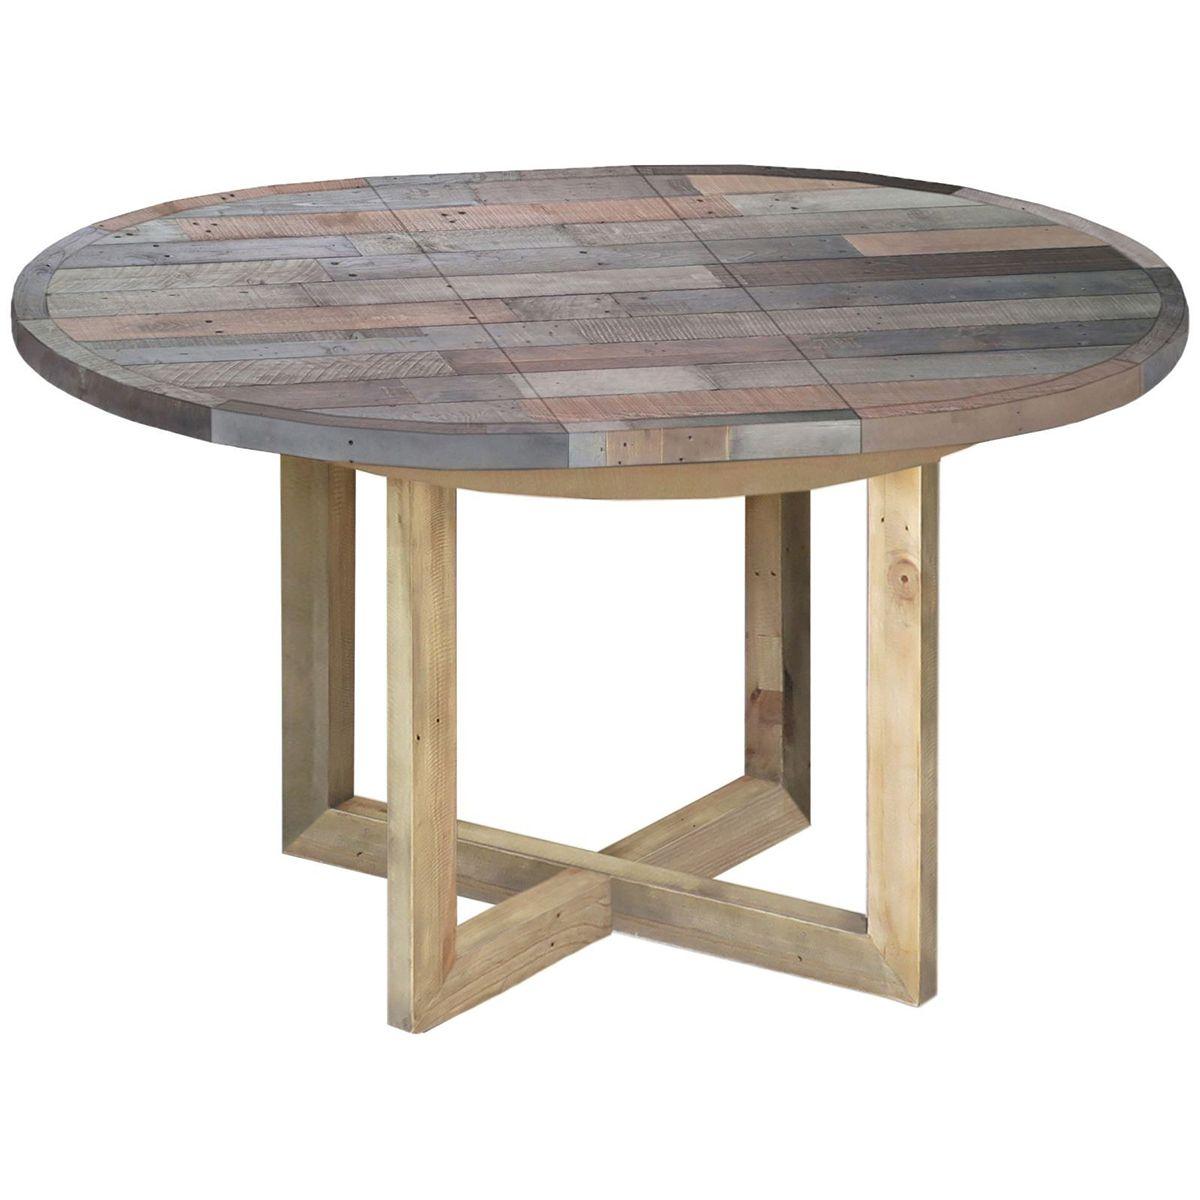 Toronto Reclaimed Pine Round Extending Dining Table | \